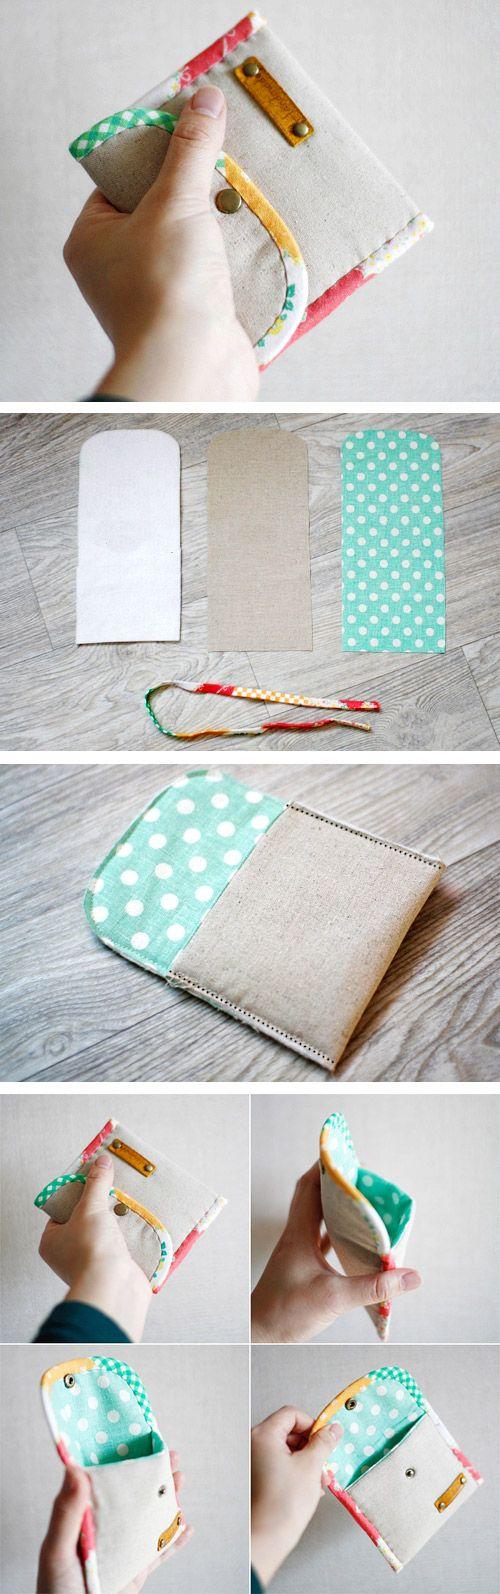 DIY Simple Purse